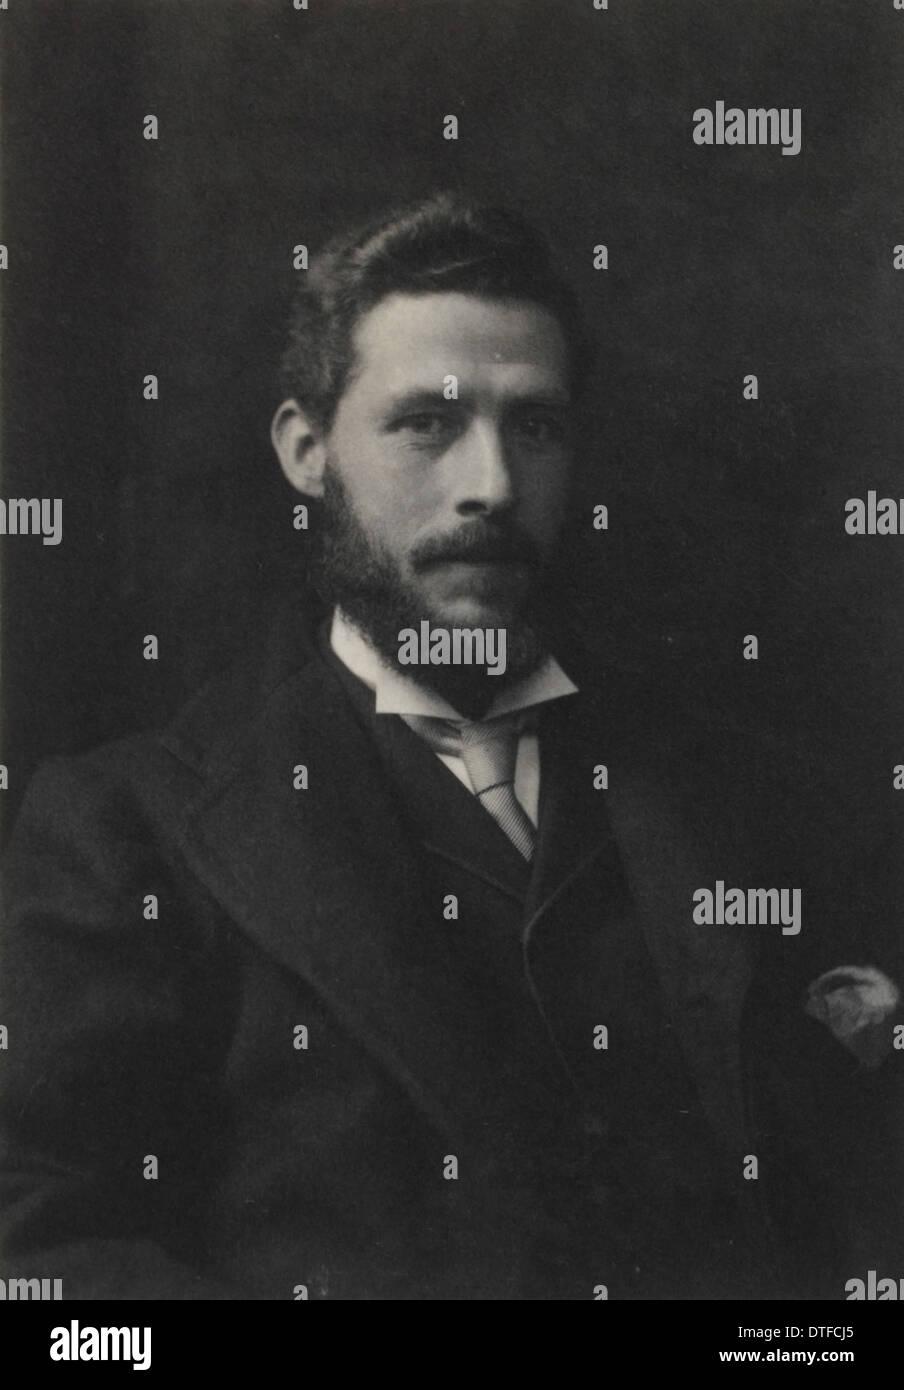 James Chumley - Stock Image